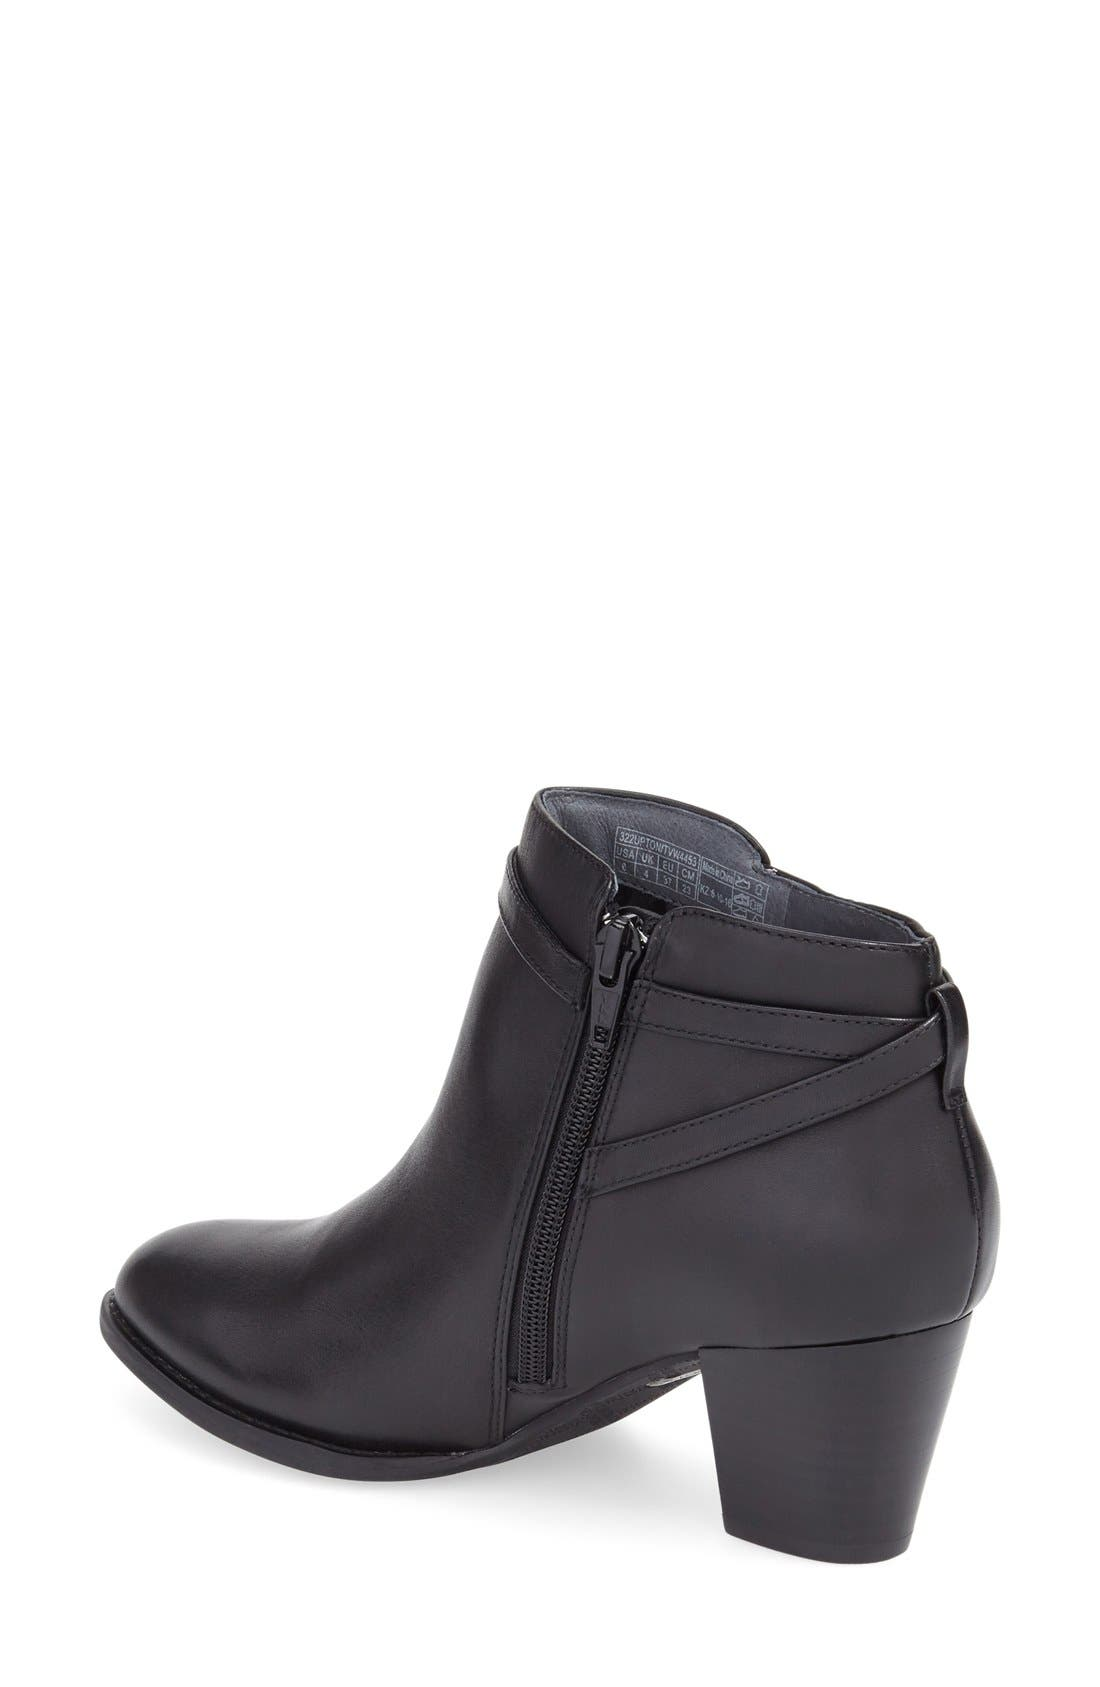 'Upton' Block Heel Boot,                             Alternate thumbnail 2, color,                             Black Leather